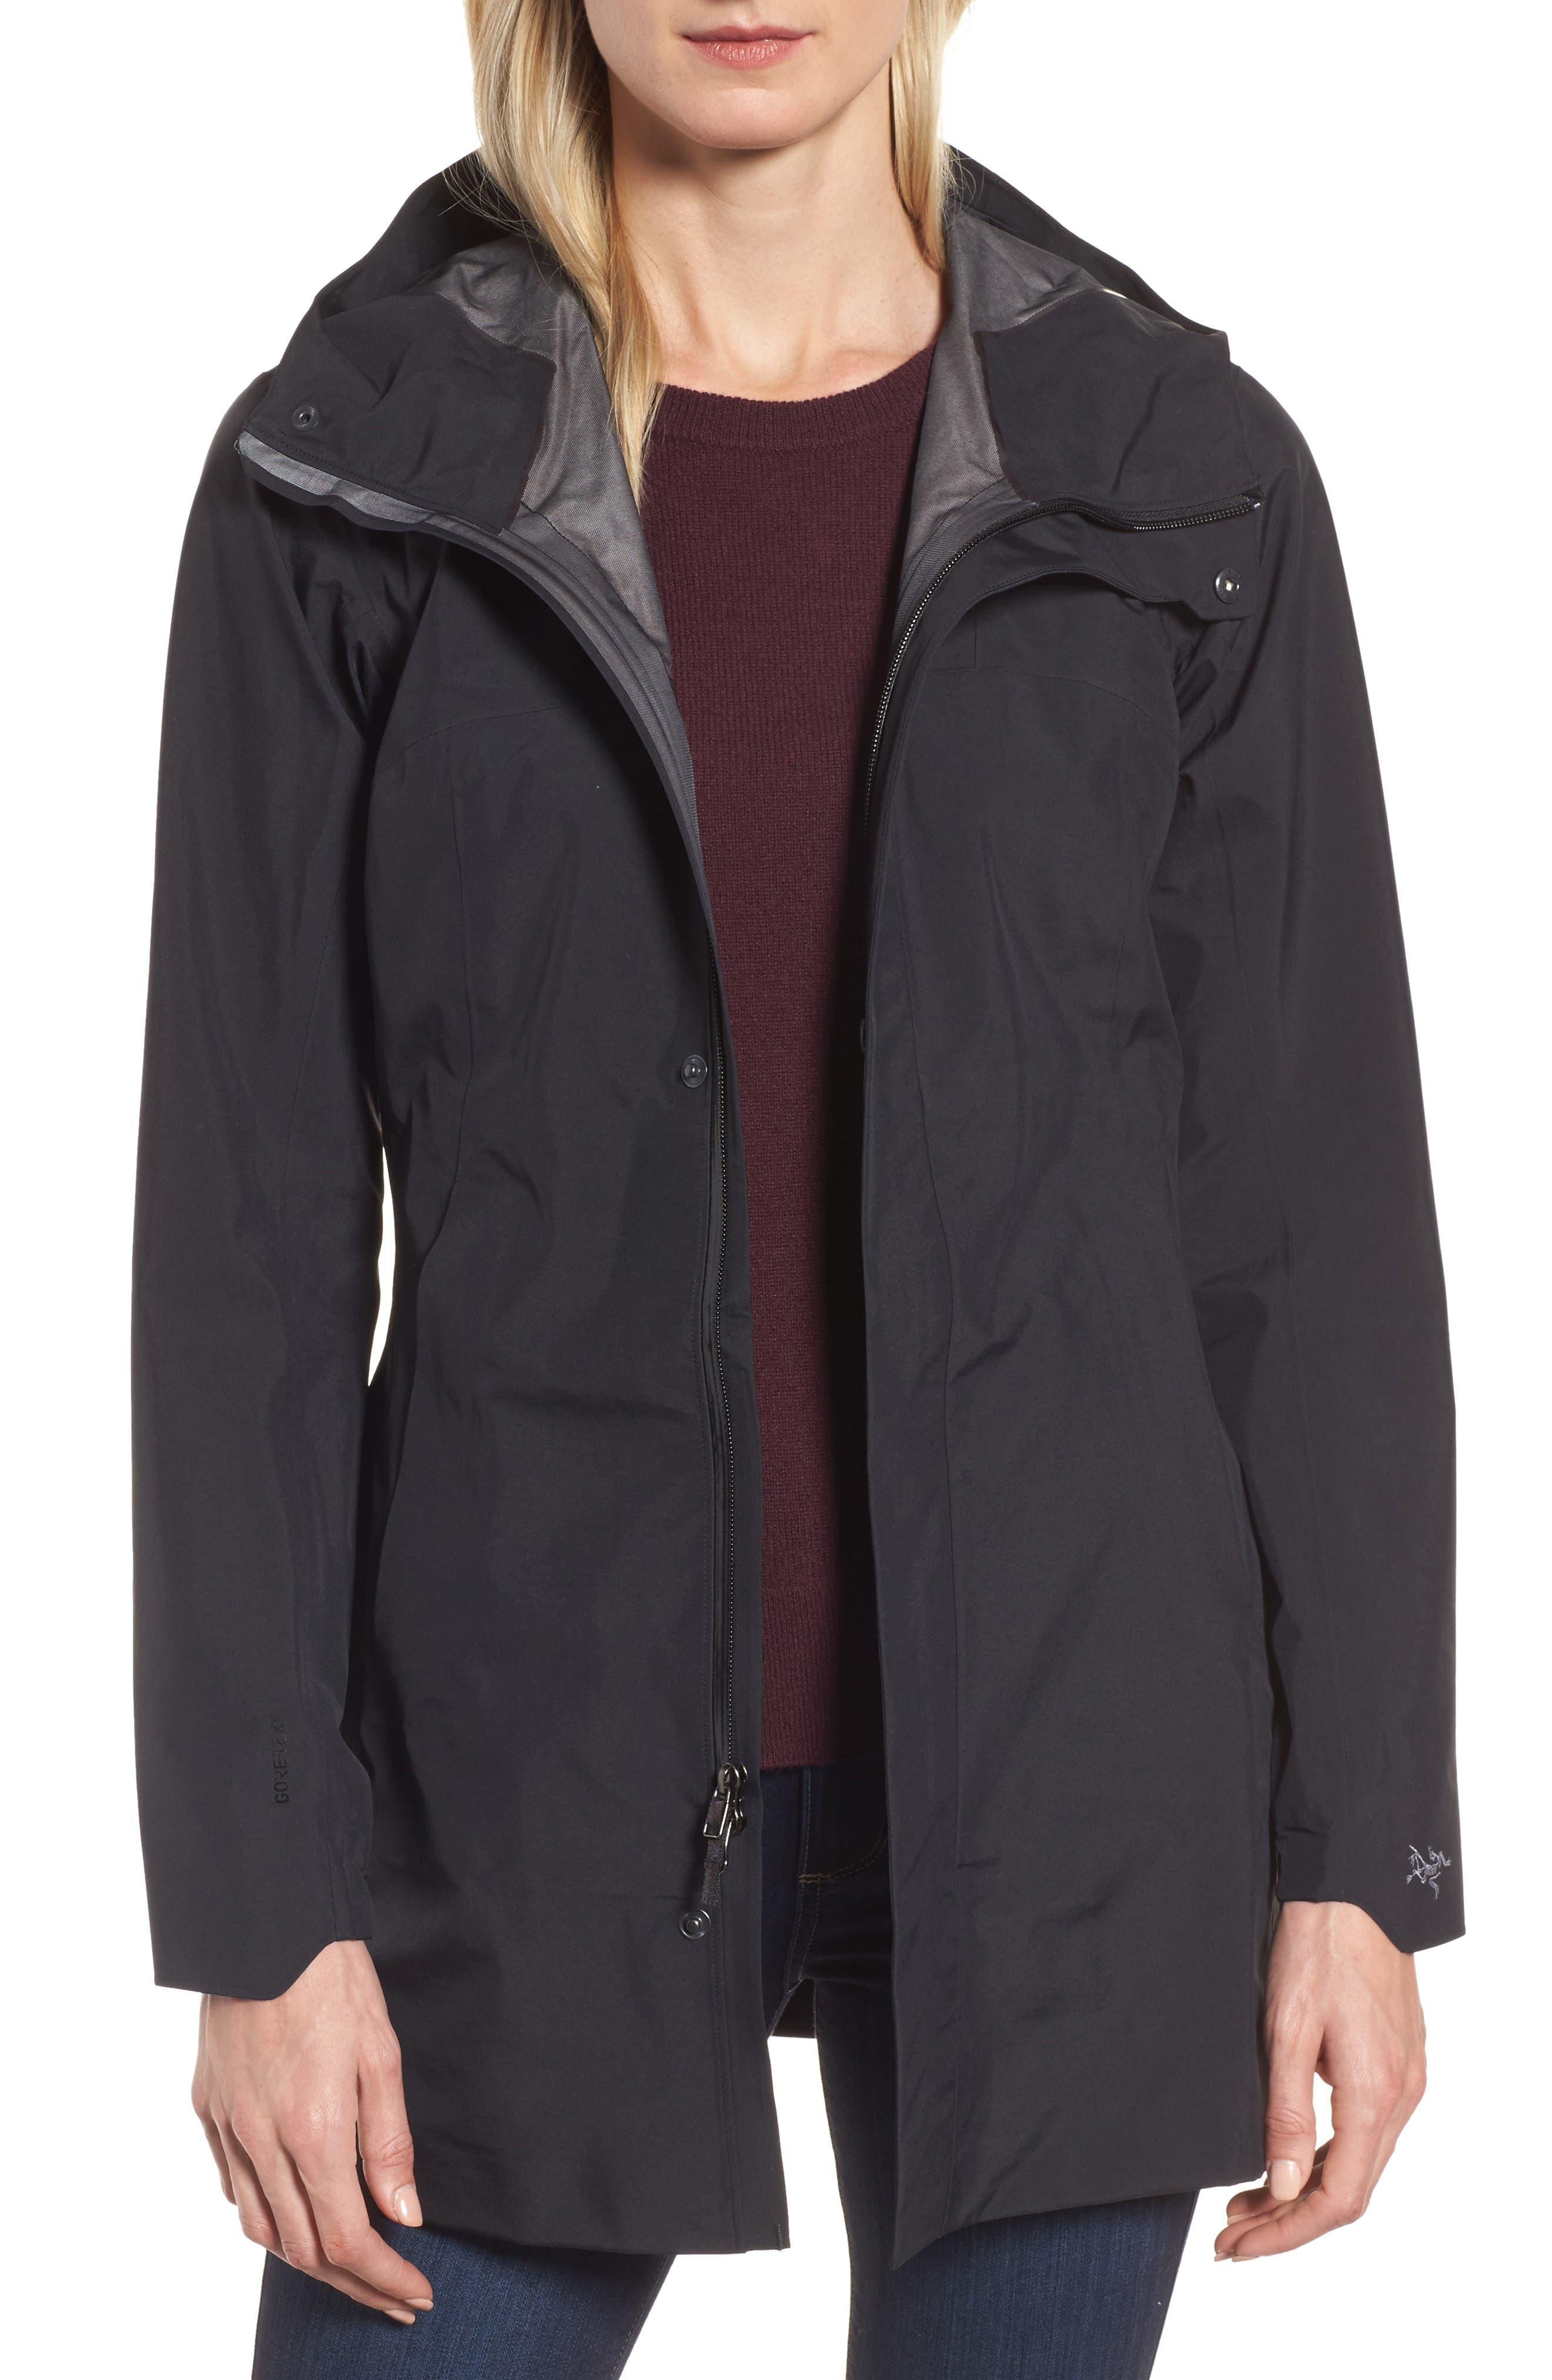 Main Image - Arc'teryx Codetta Waterproof Relaxed Fit Gore-Tex® 3L Rain Jacket